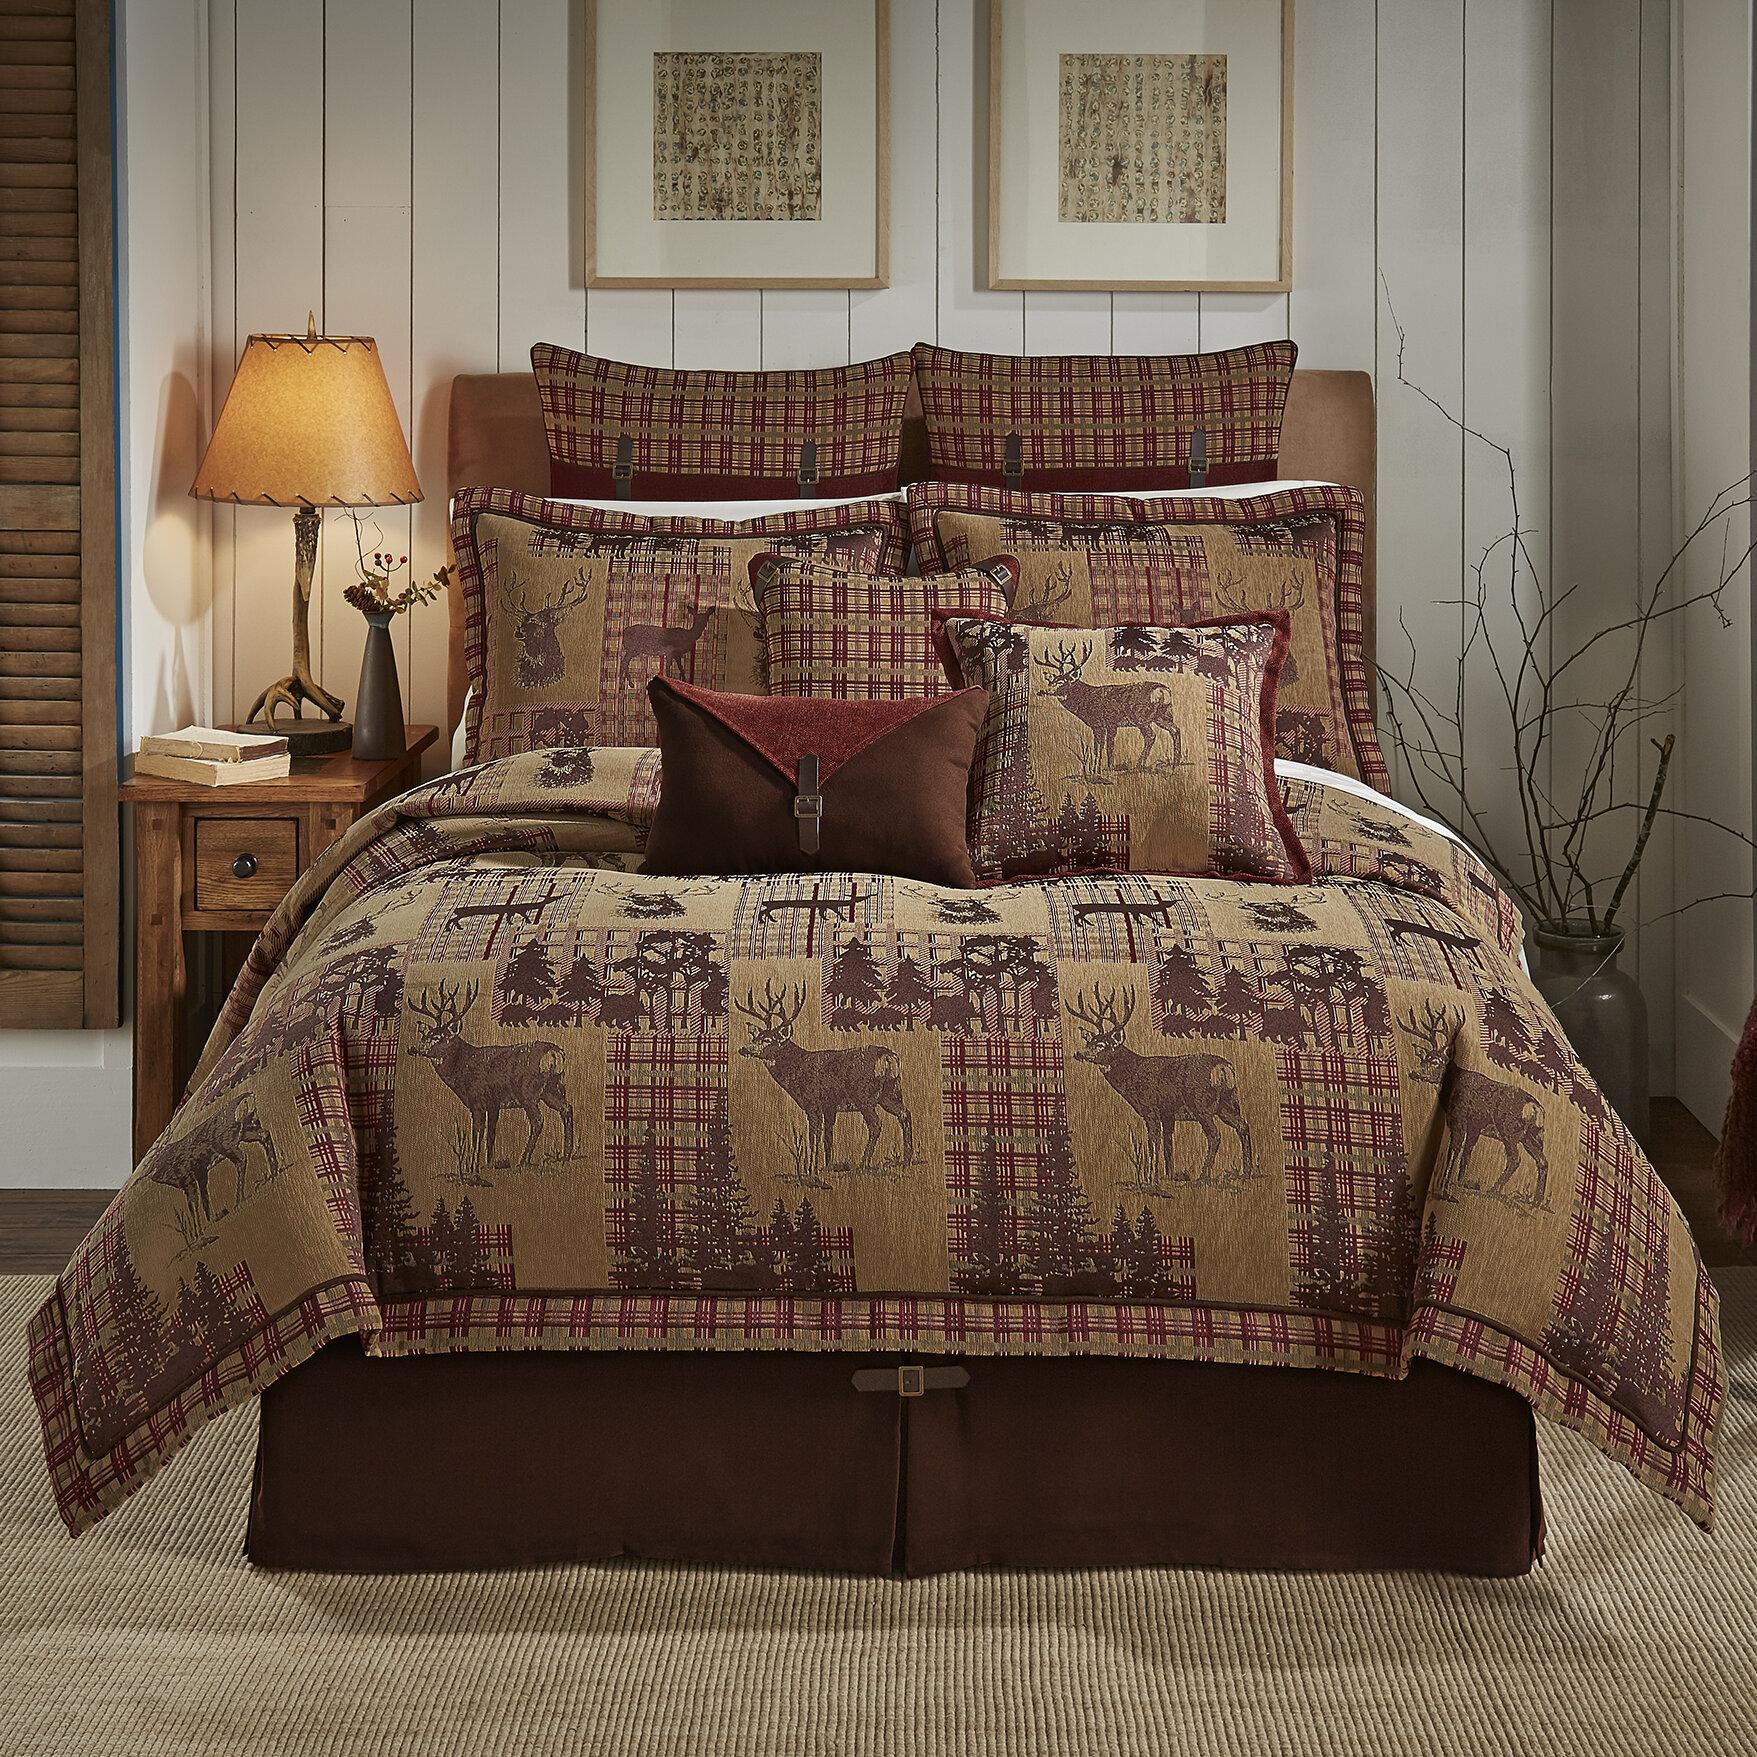 Croscill Glendale 4 Piece Reversible Comforter Set & Reviews | Wayfair